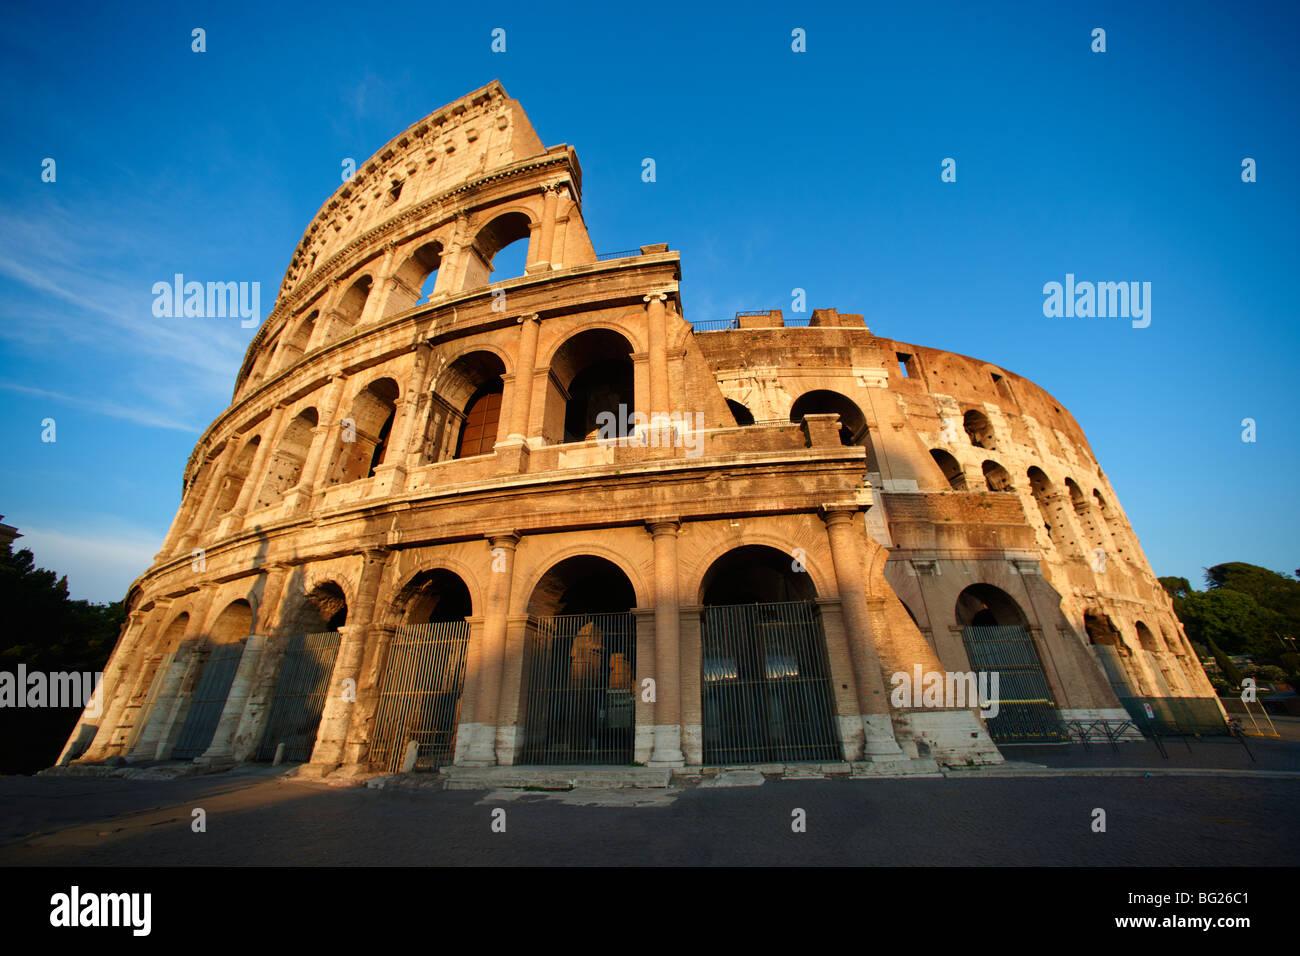 Le Colisée (Colosseo) . Rome Photo Stock